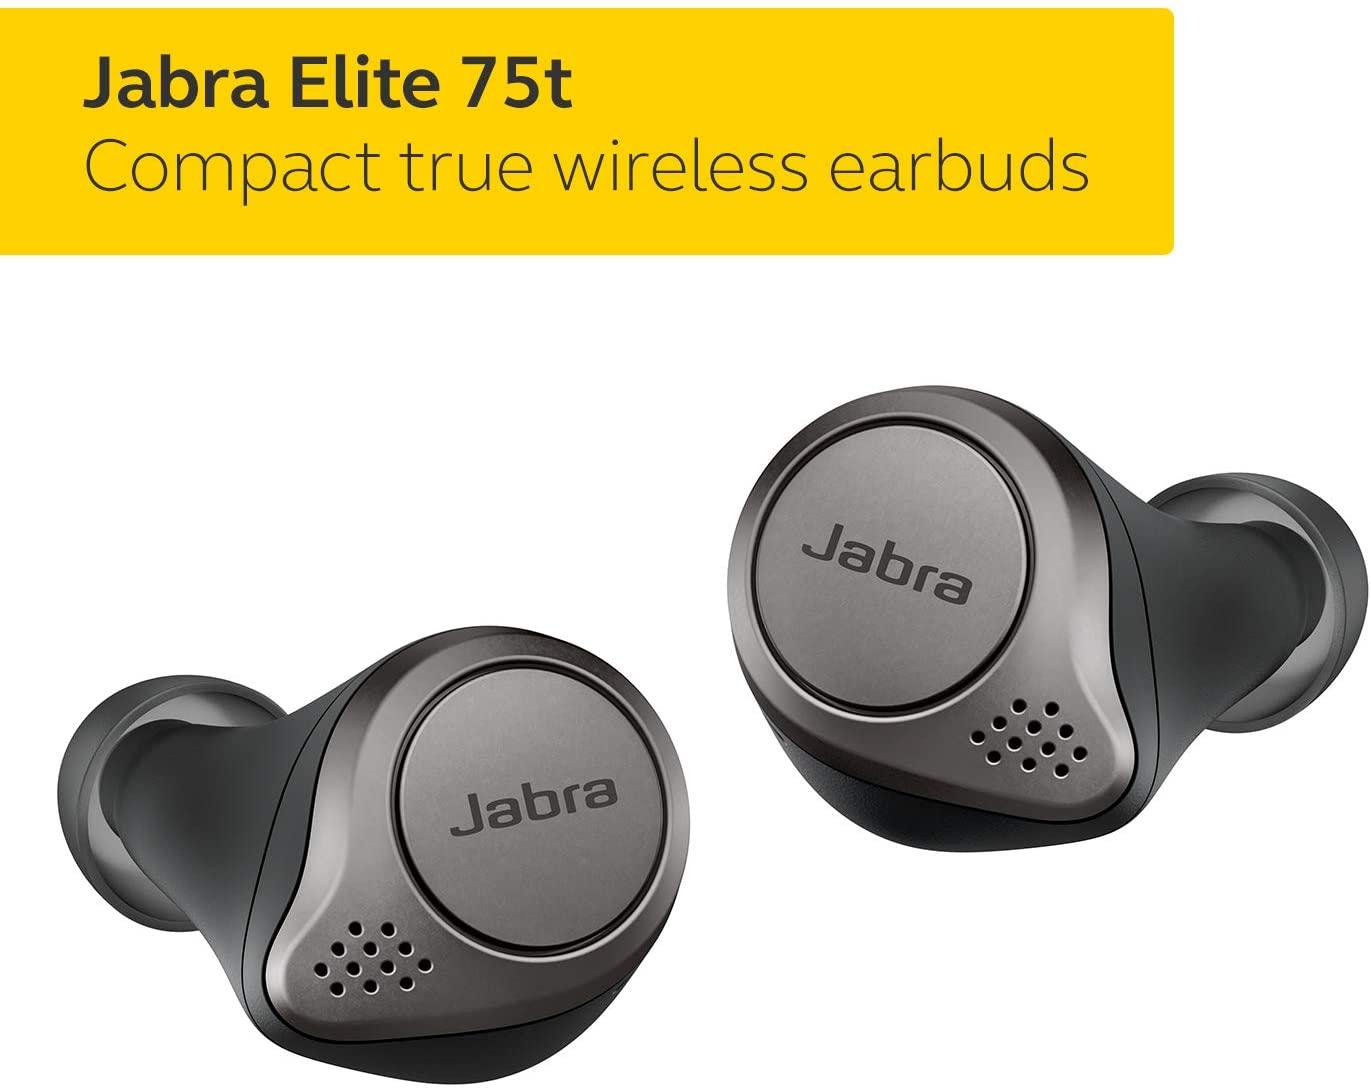 Jabra Elite 75t Earbuds Comfortable